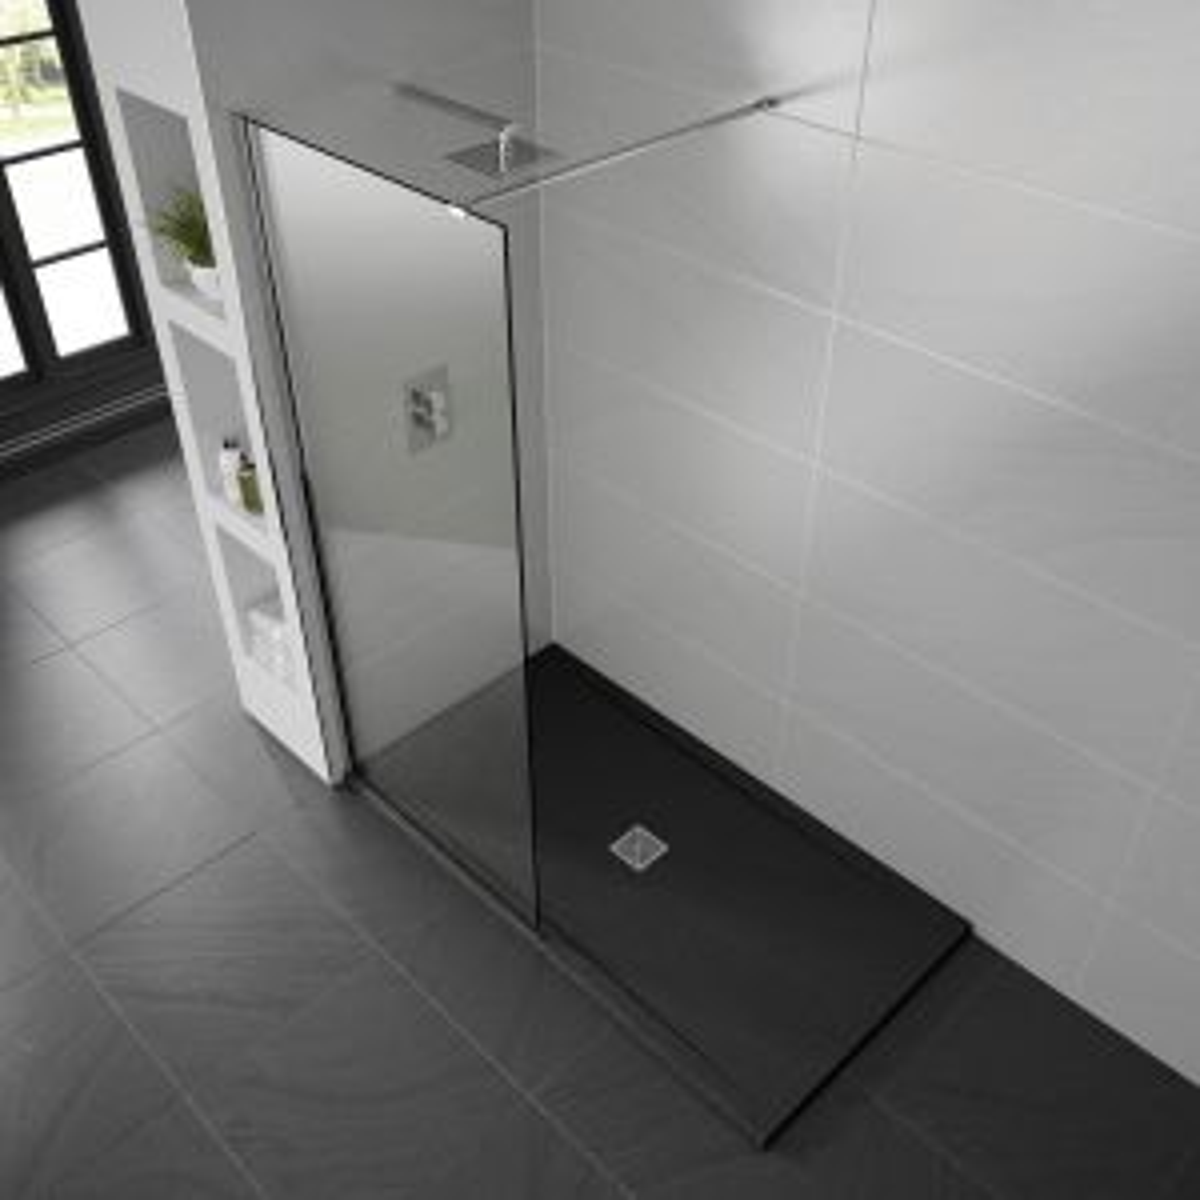 Aquadart Black Slate Shower Tray 1200 x 700 Lifestyle